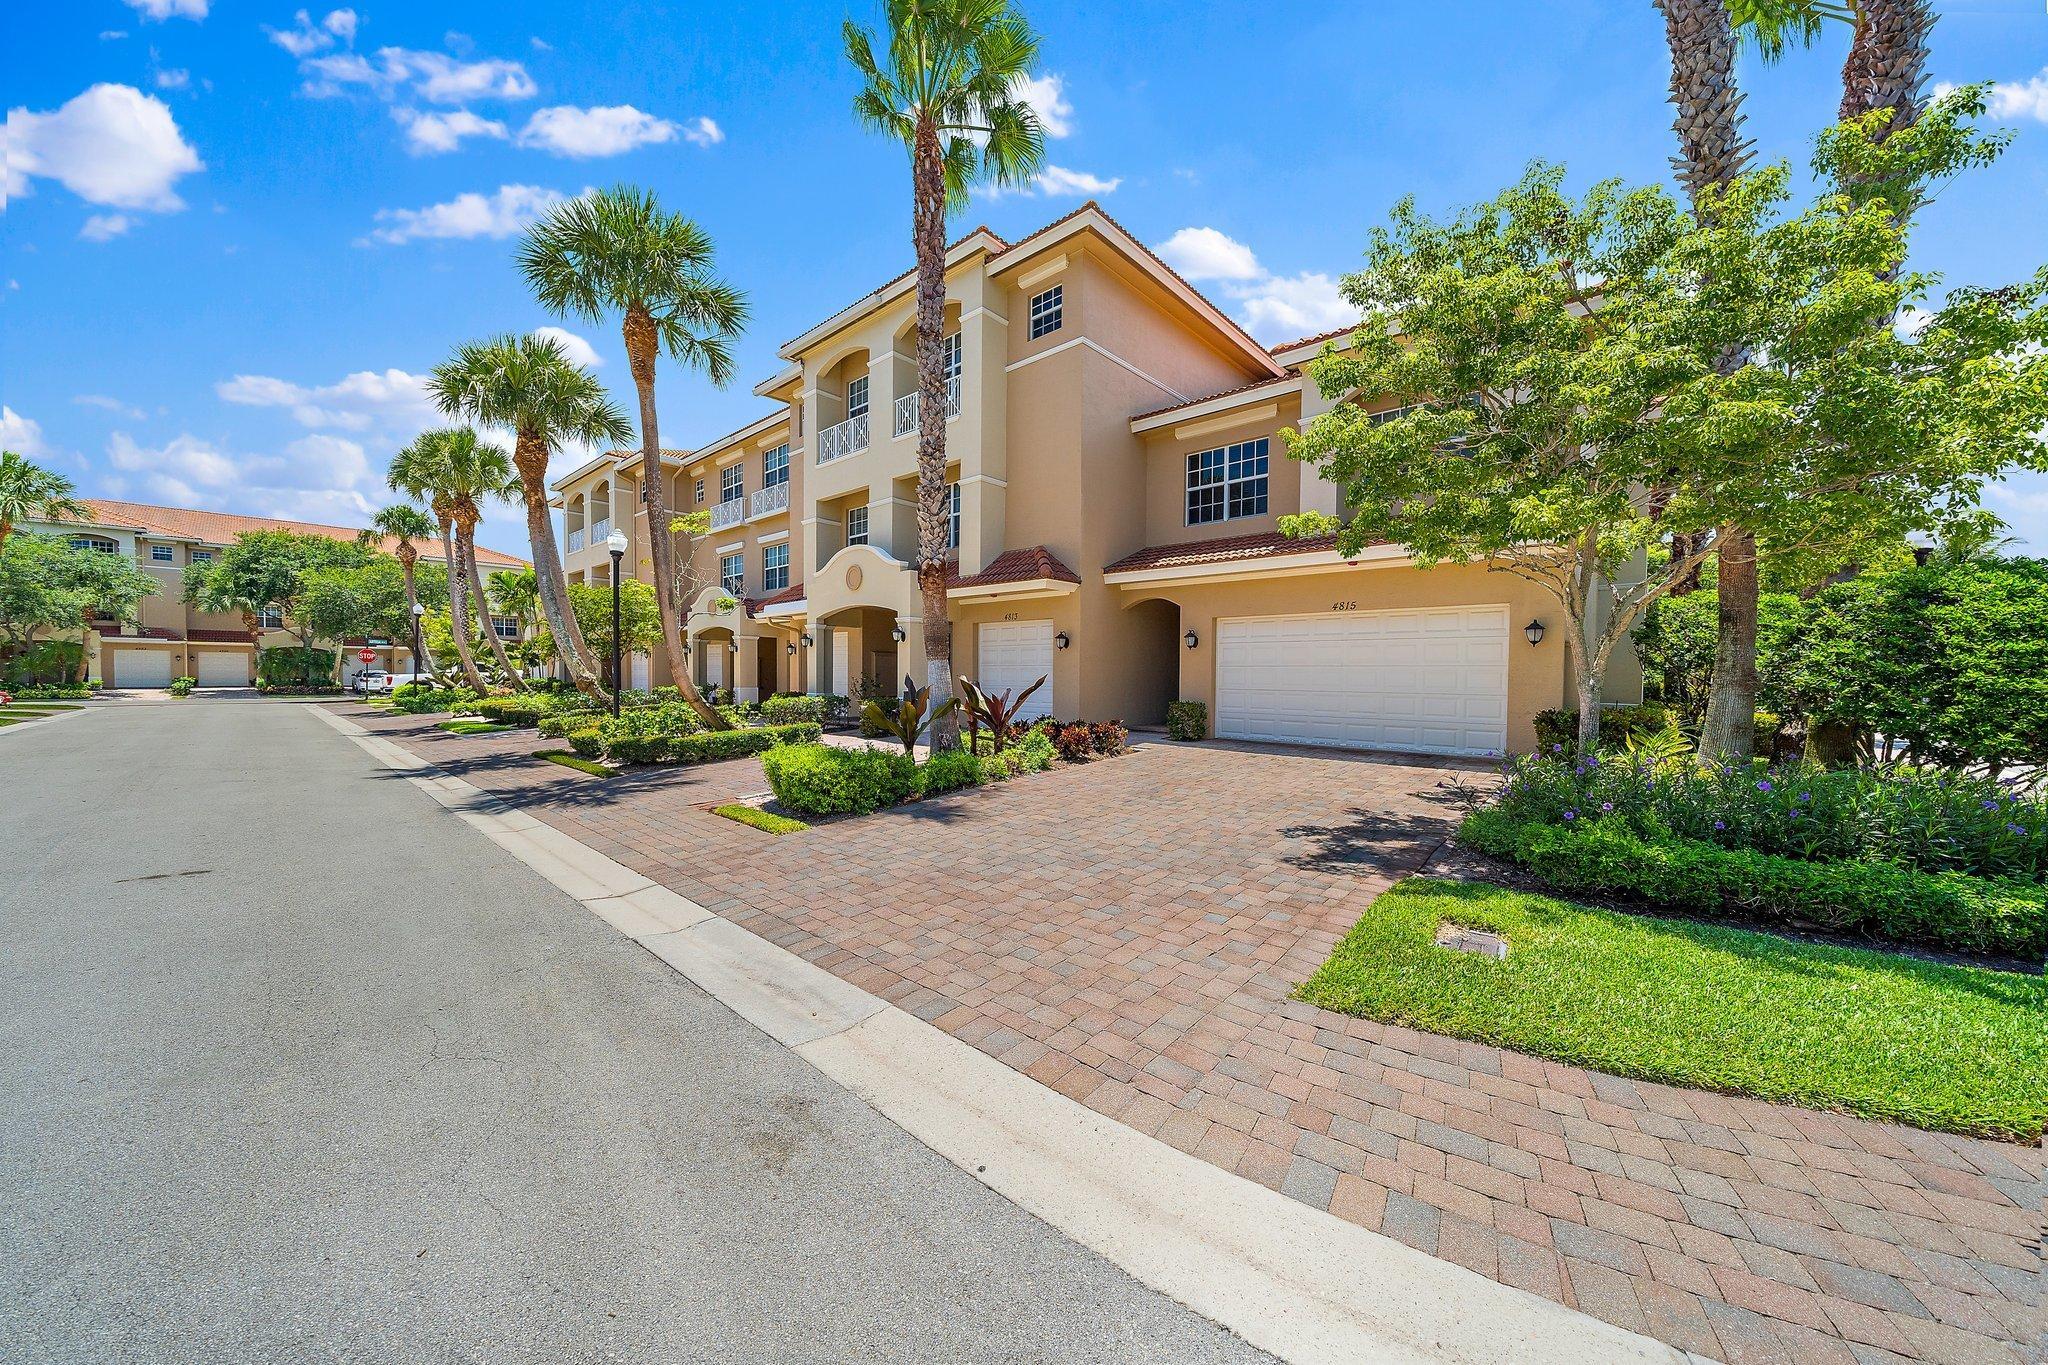 4813 Sawgrass Breeze Drive - 33418 - FL - Palm Beach Gardens